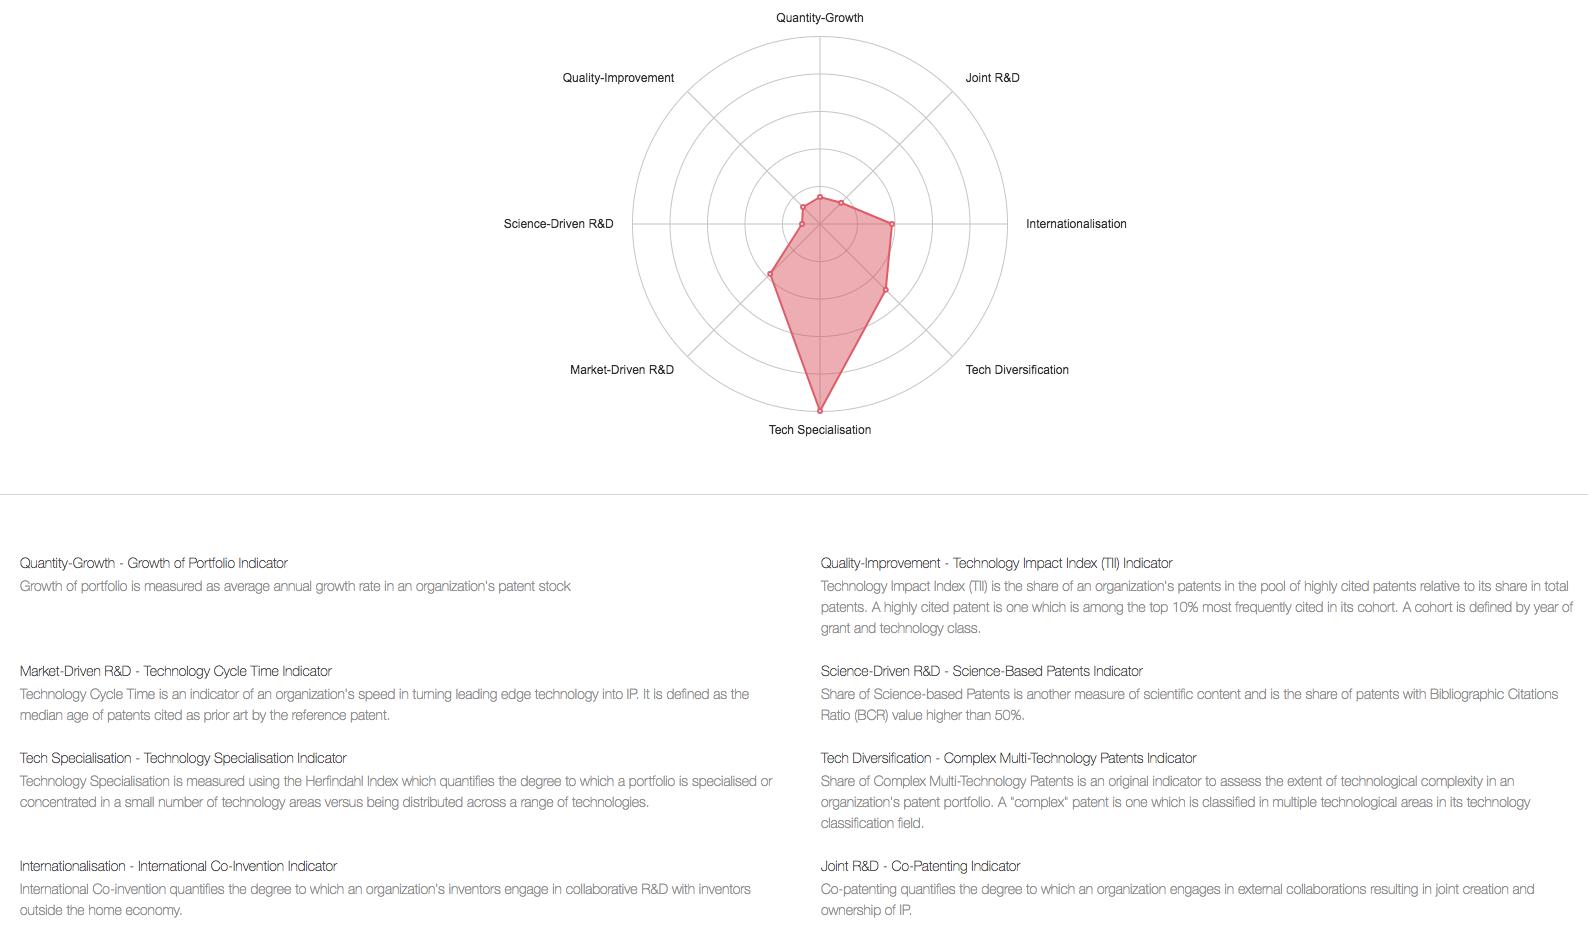 IBM IP Strategy Map